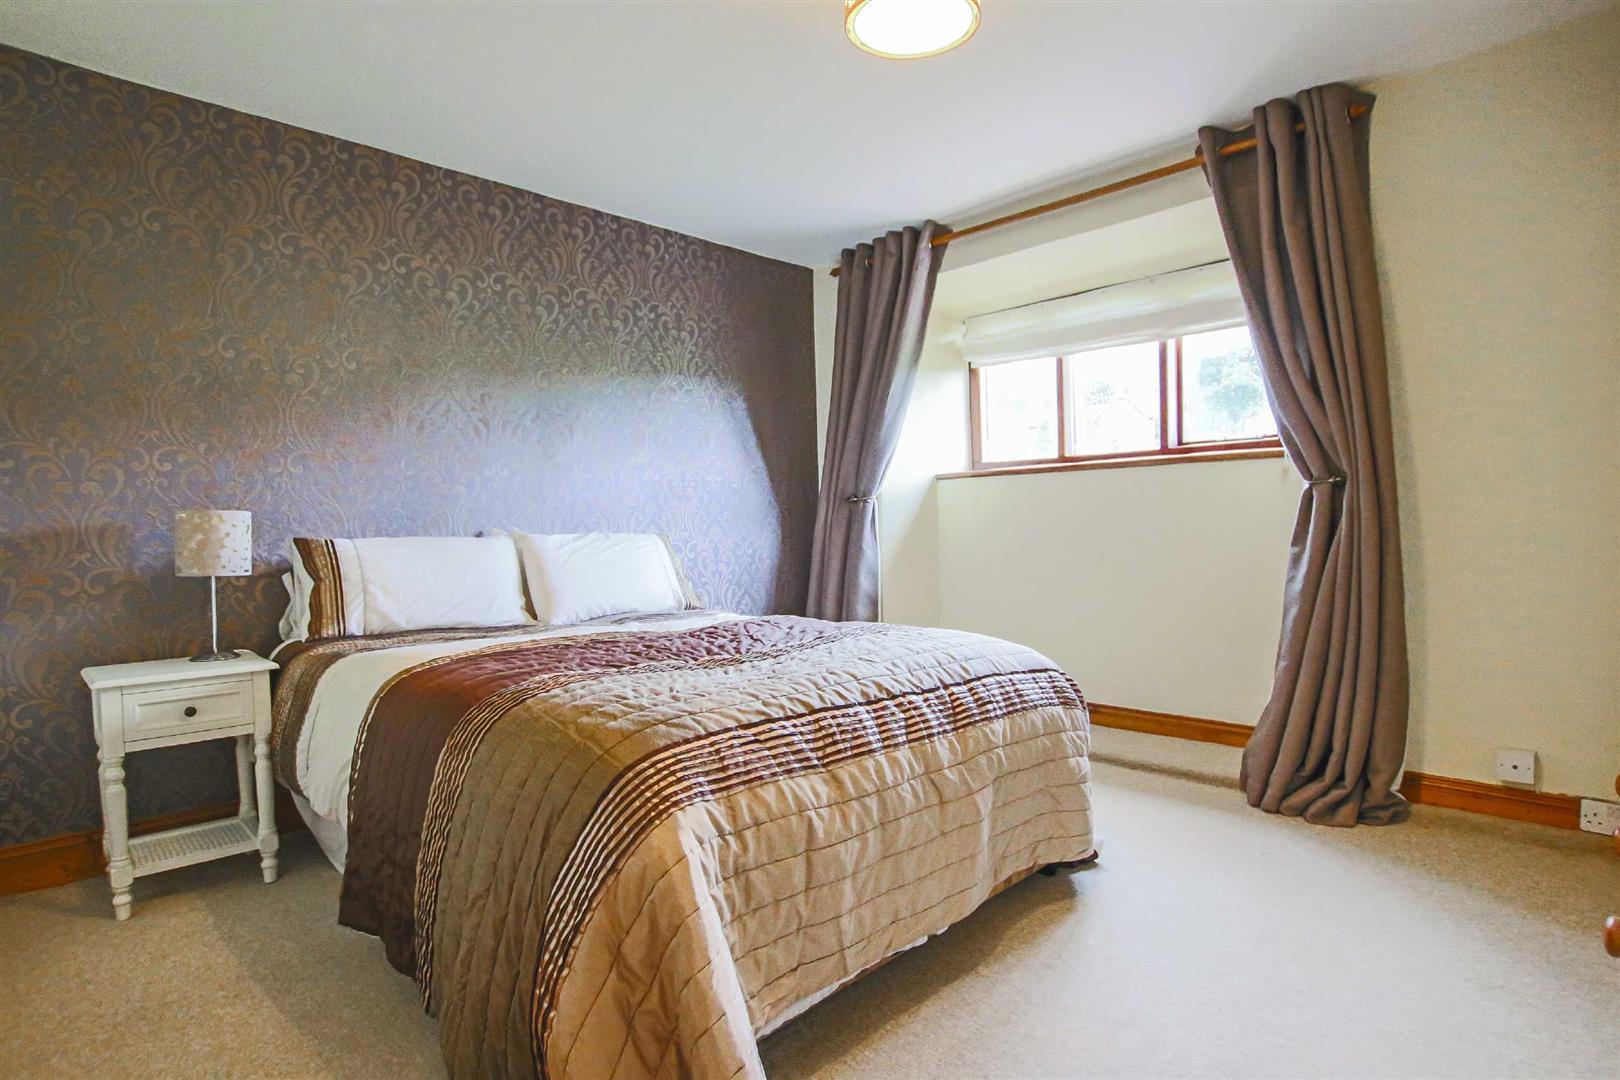 5 Bedroom Barn Conversion For Sale - p026519_18.jpg